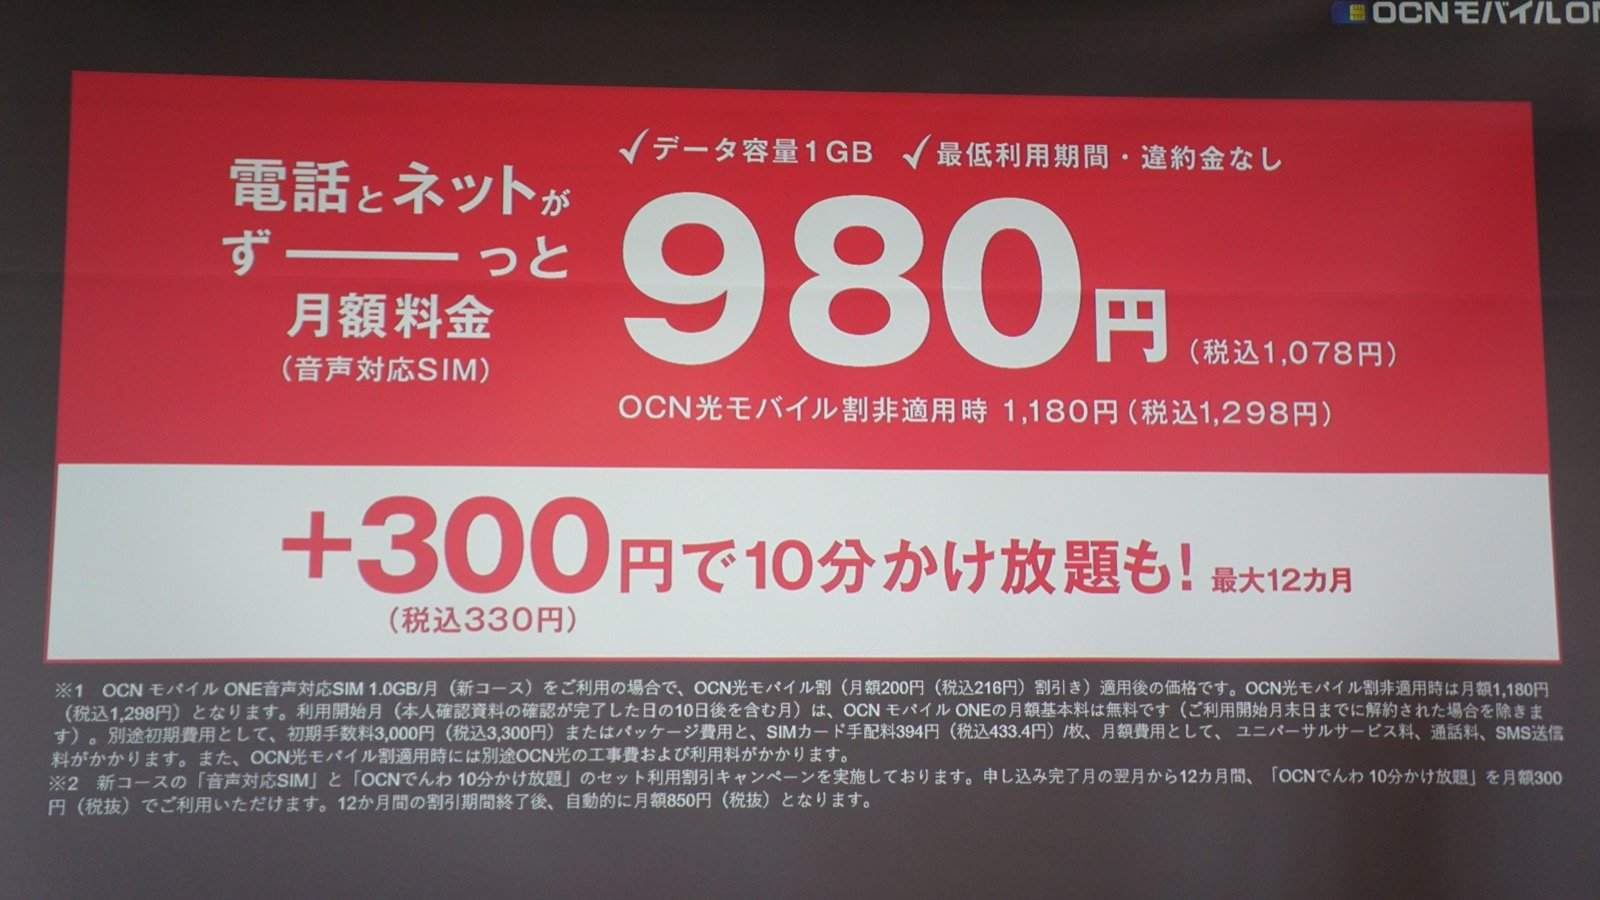 OCNモバイルONE、月額1,180円〜の新料金プラン発表。違約金と最低利用期間なし